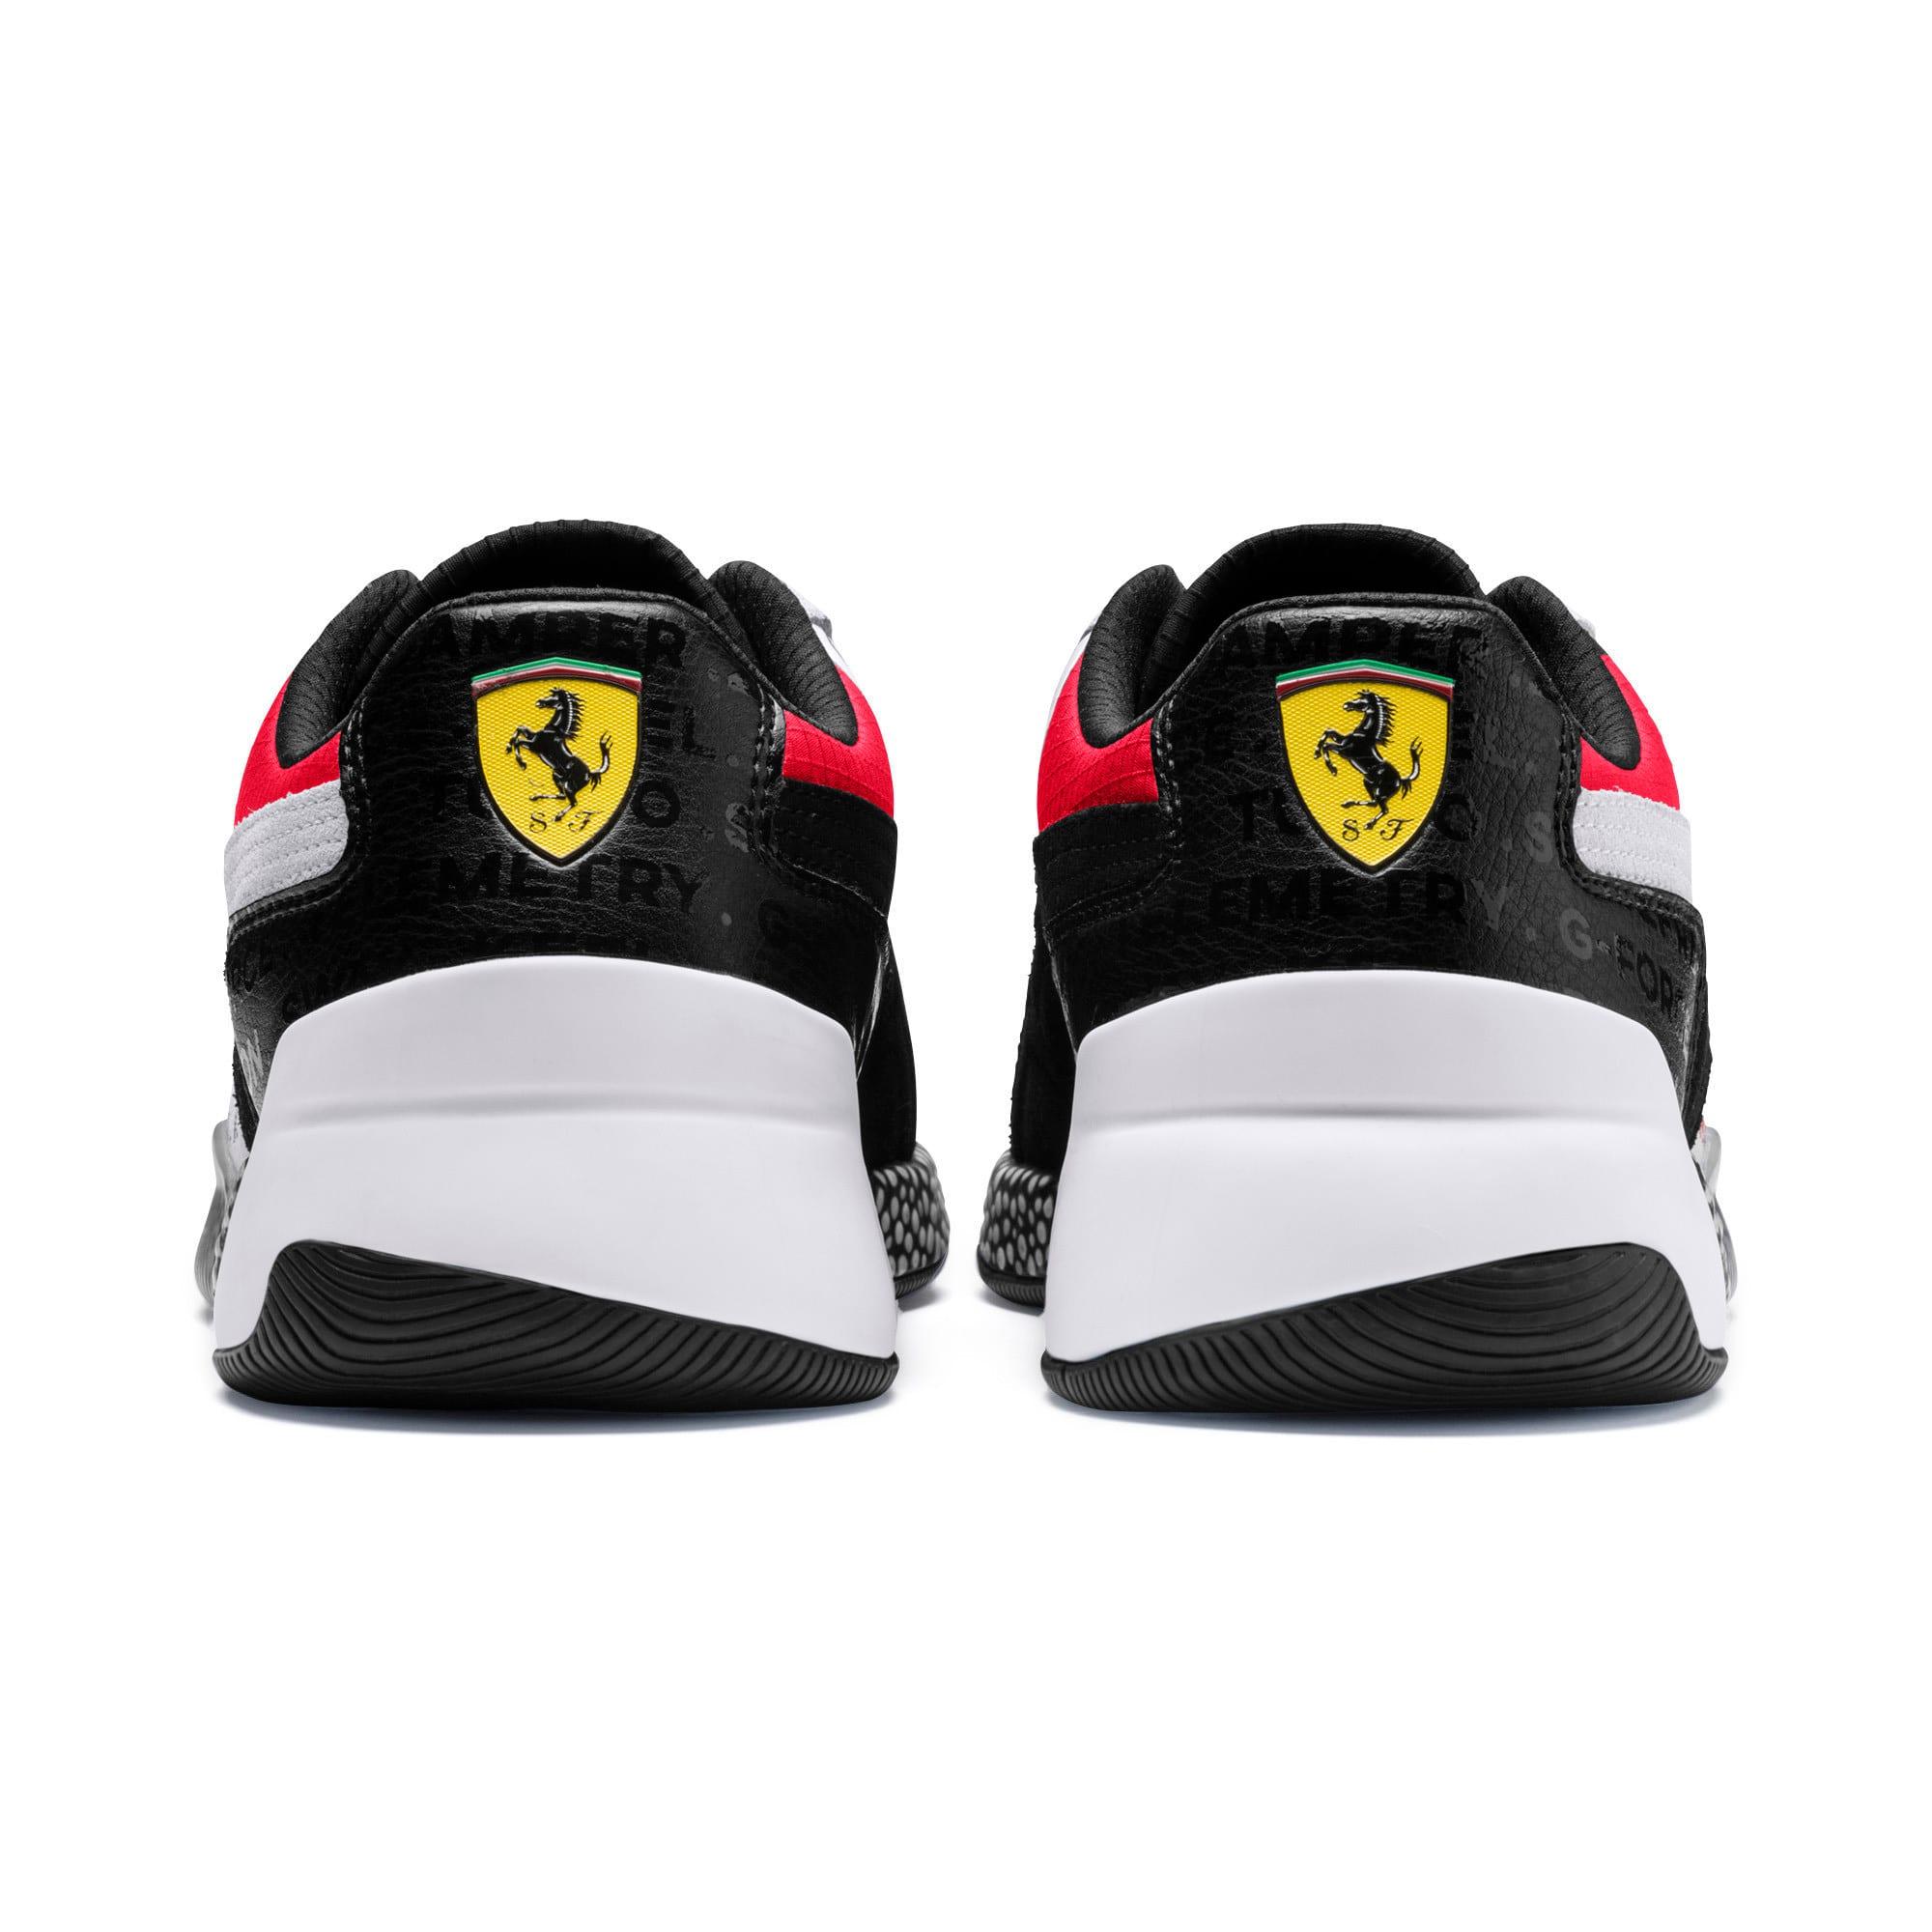 Thumbnail 3 of Scuderia Ferrari Speed Hybrid, Black-White-Rosso Corsa, medium